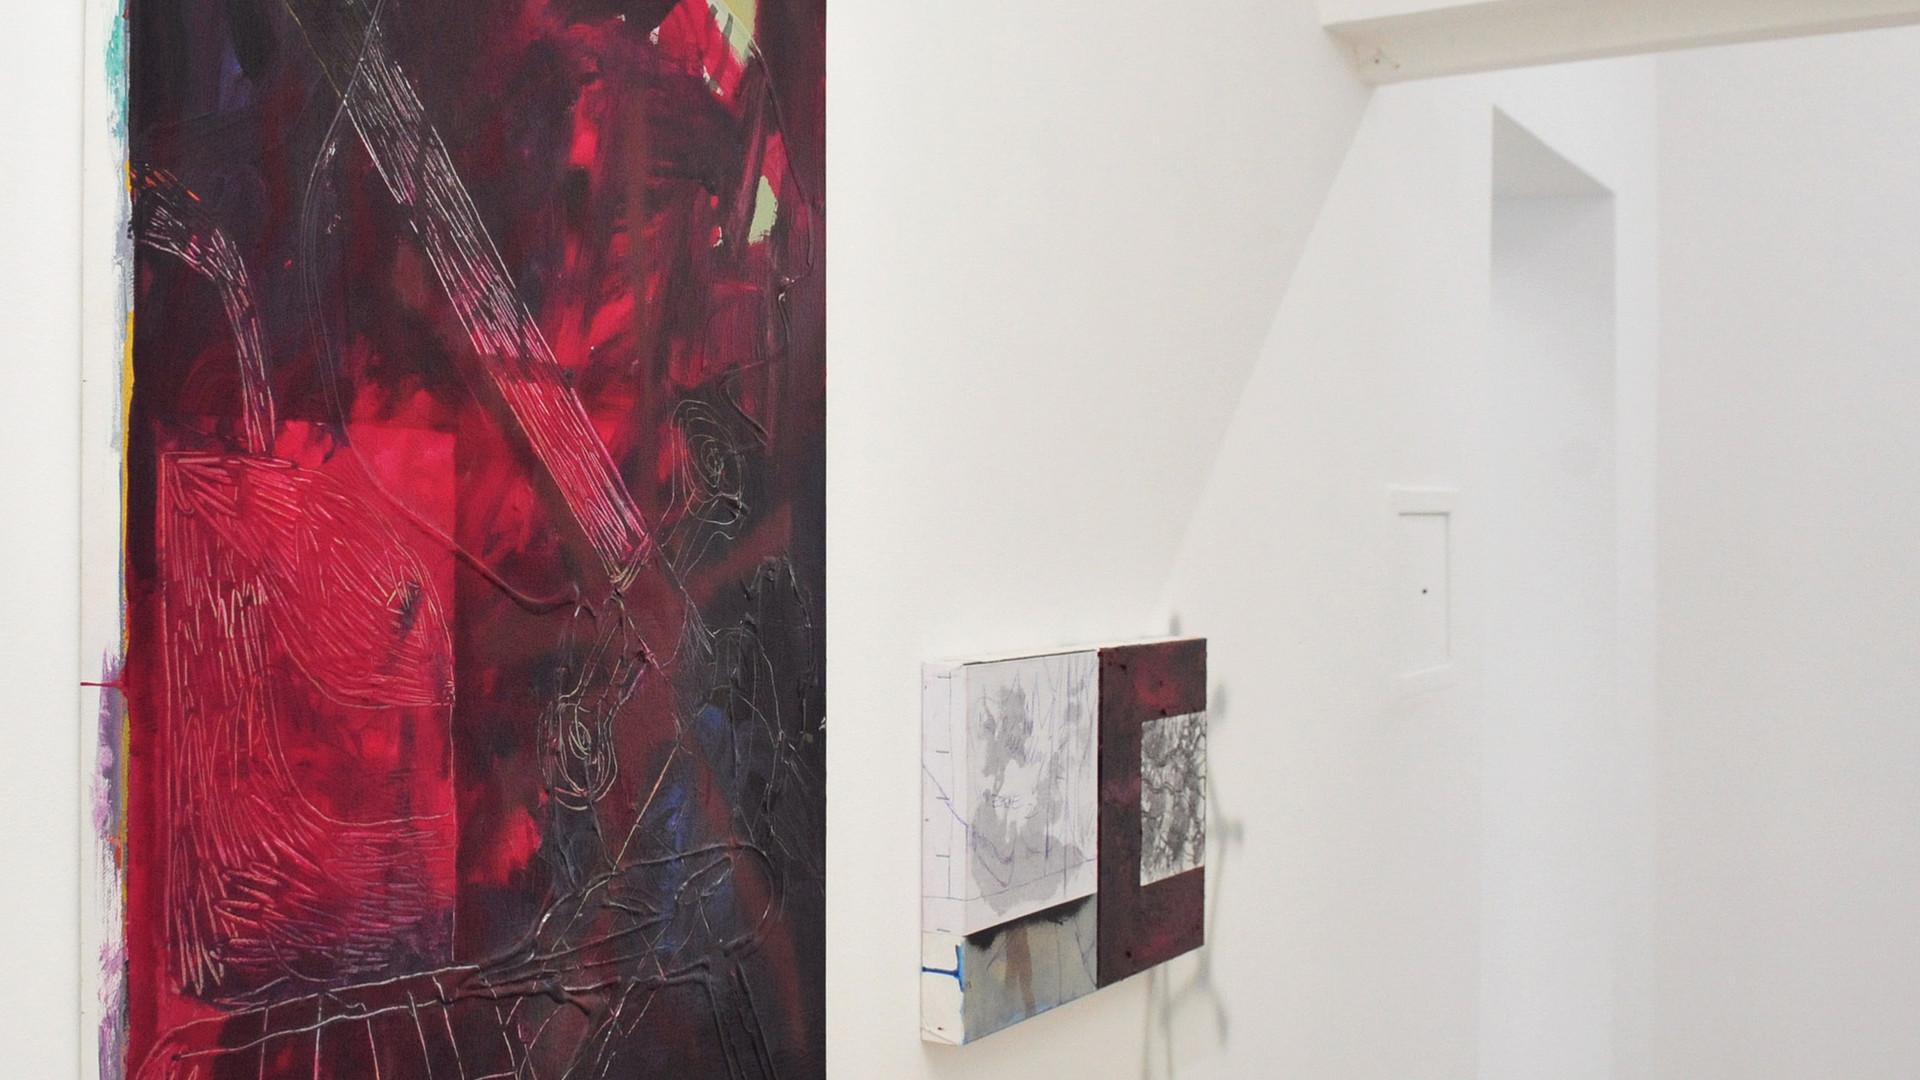 Wolfgang Günther / Emde Gallery / Soloshow / Mainz, 2020